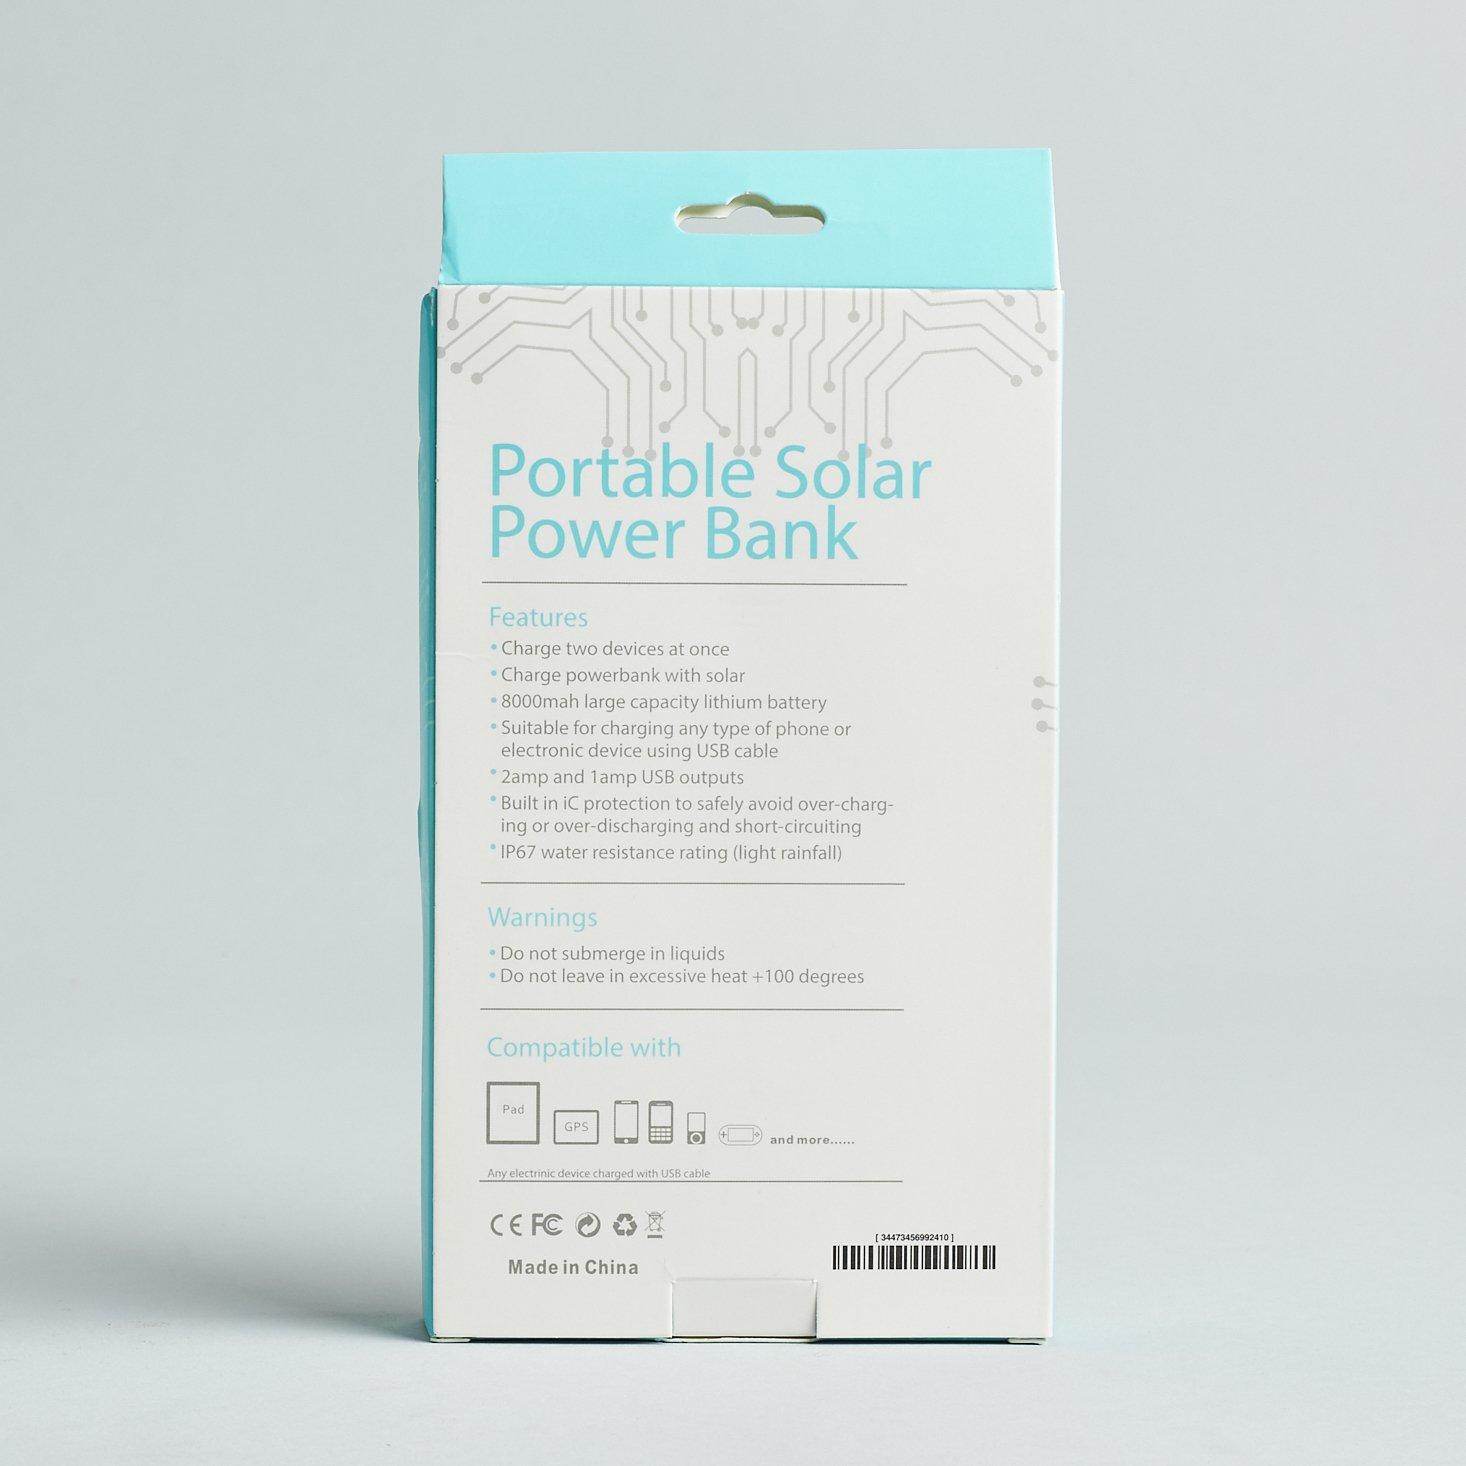 Breo Box Summer June 2021 solar charger